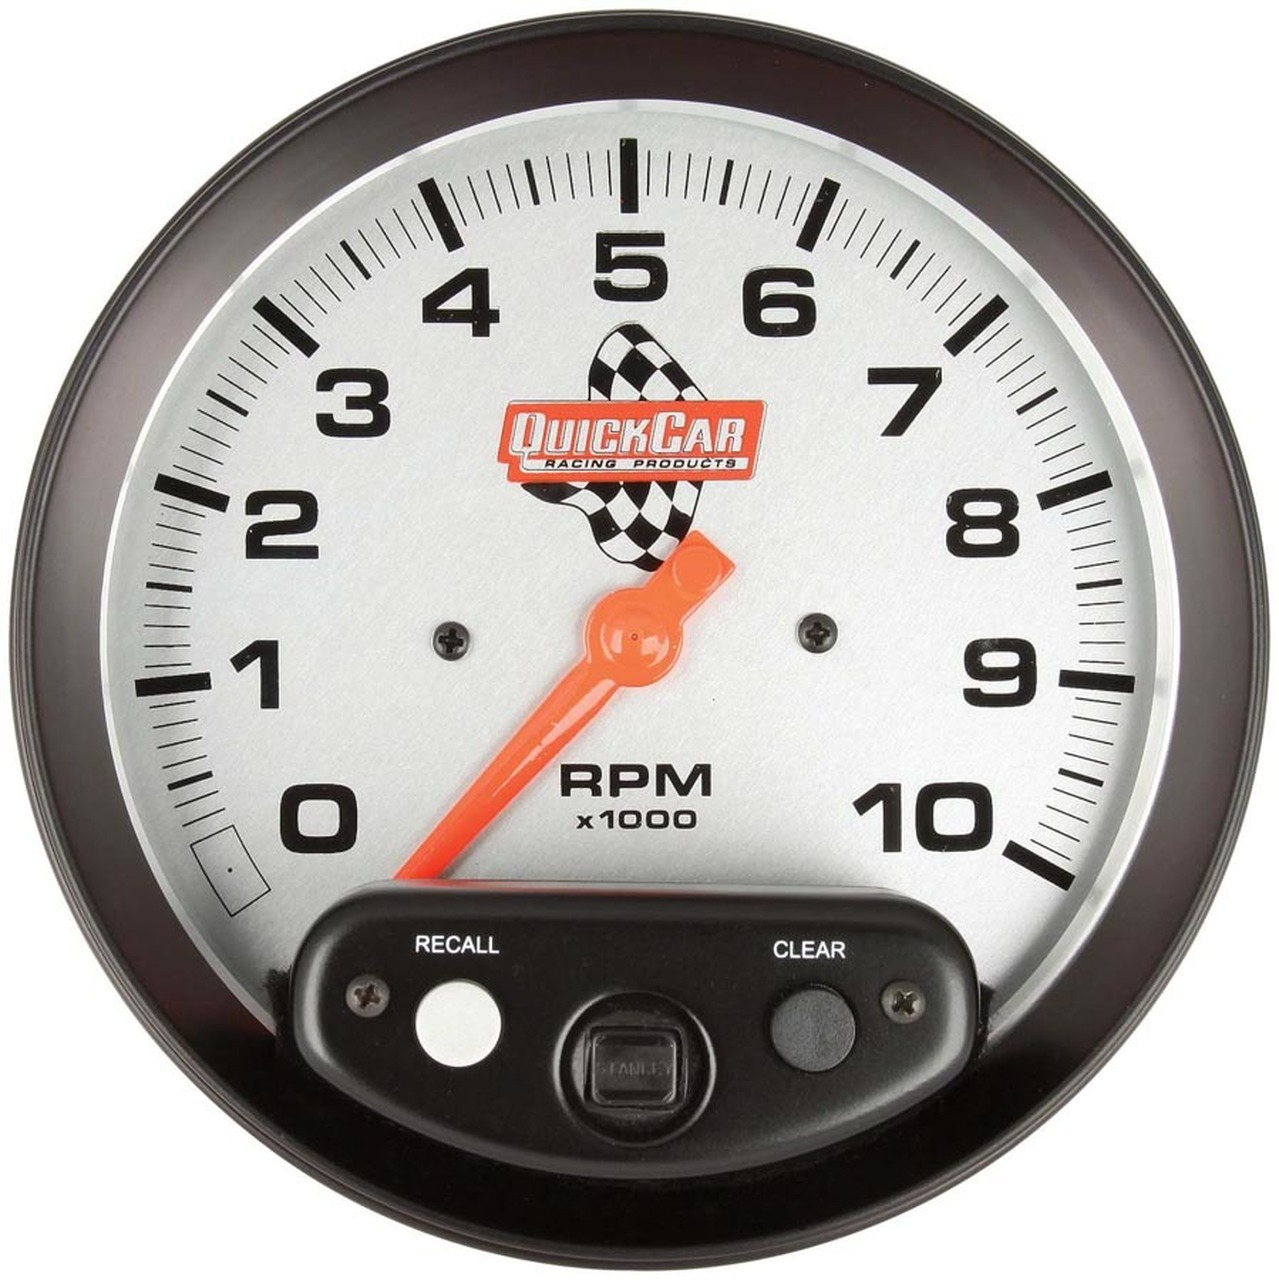 611 6001 5in tach w memory quickcar quality performance quick car tach wiring diagram [ 1279 x 1280 Pixel ]